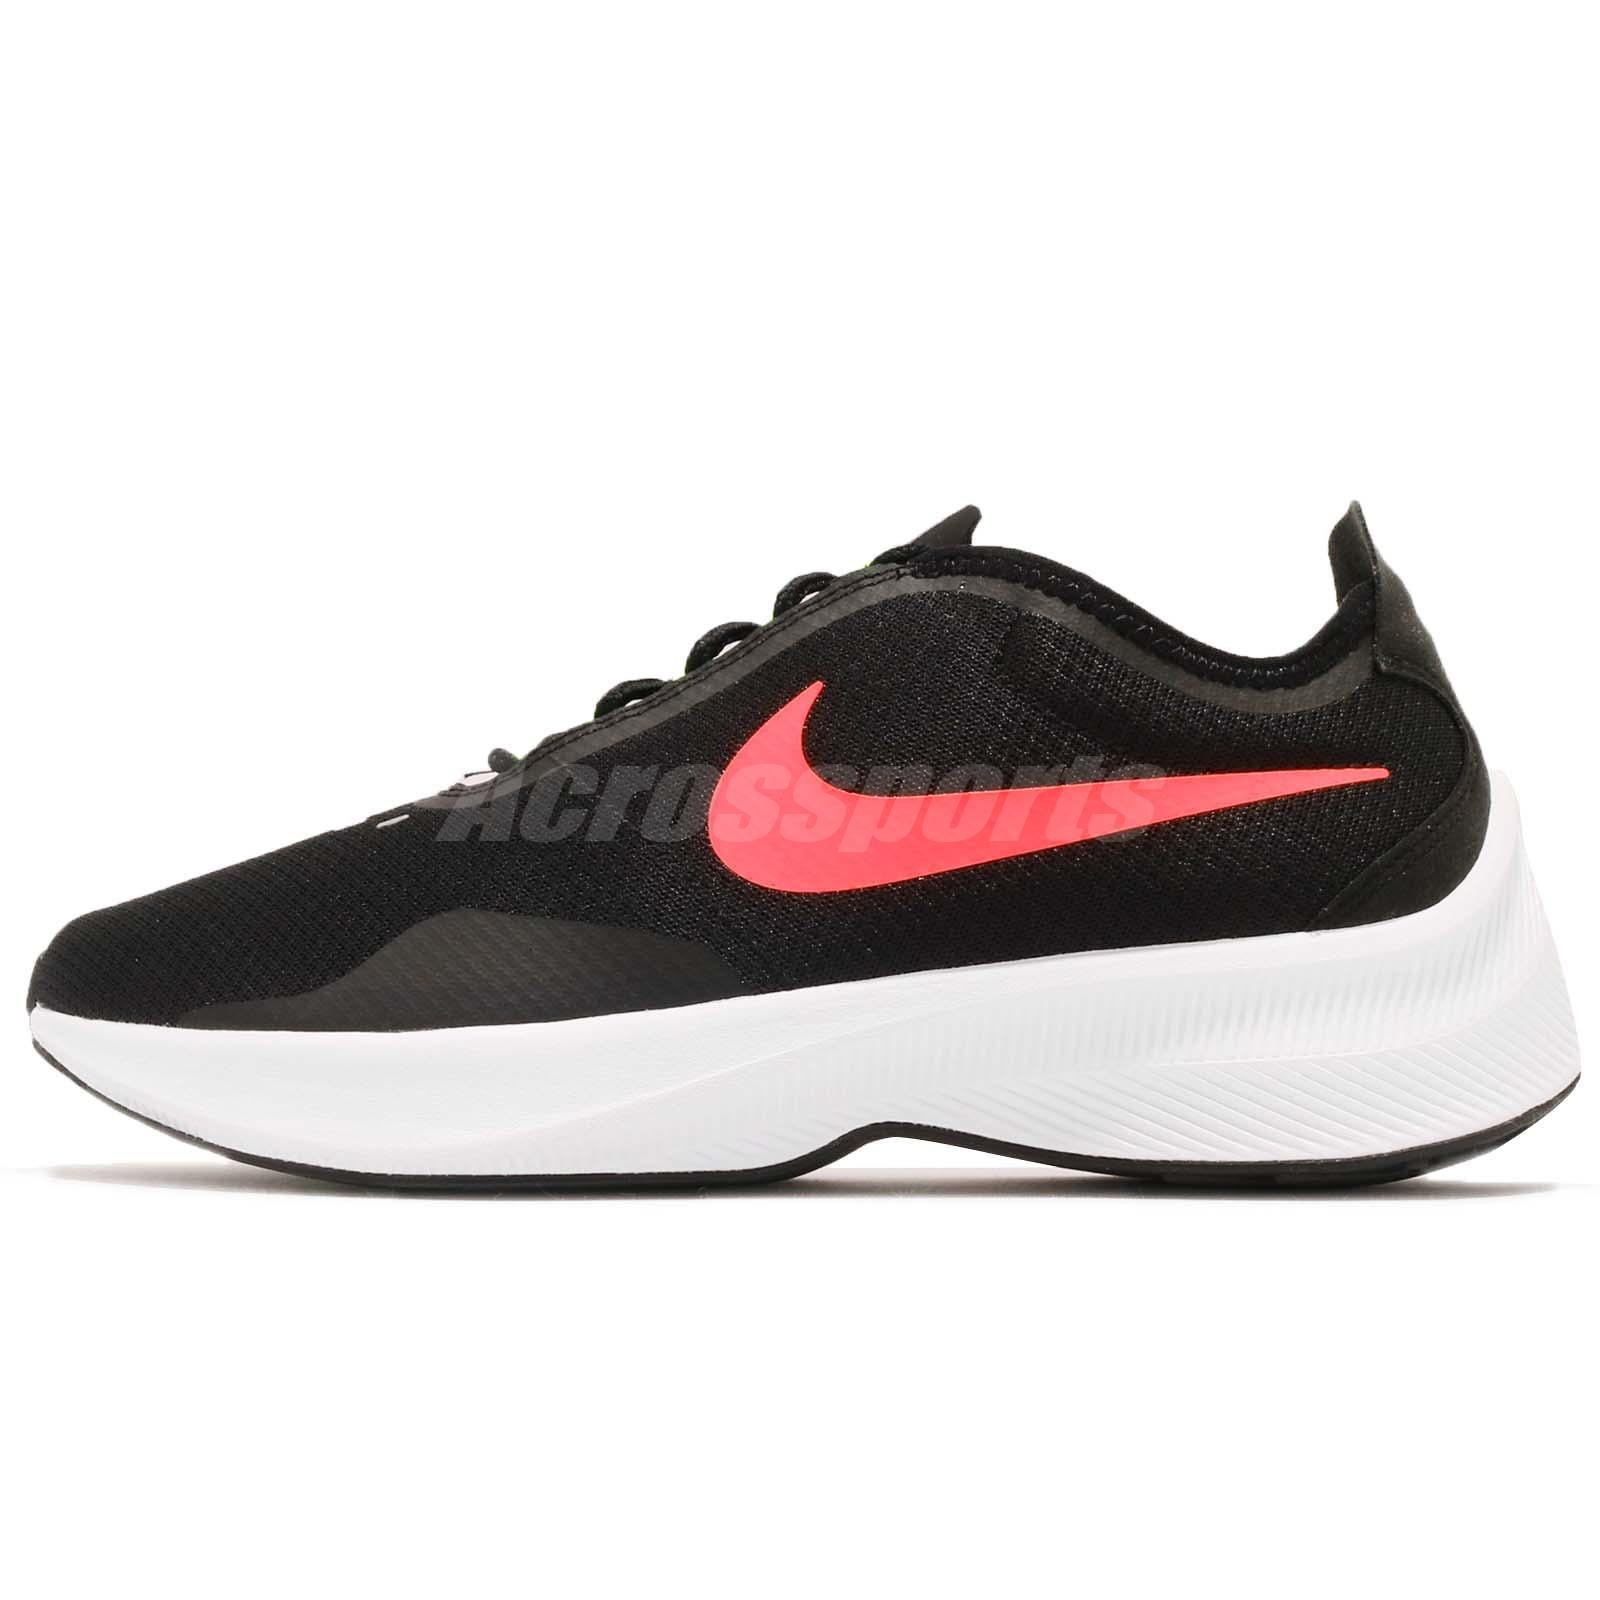 Nike EXP-Z07 Black Total Crimson White Men Running Shoes Sneakers AO1544-003 a2e0422b2